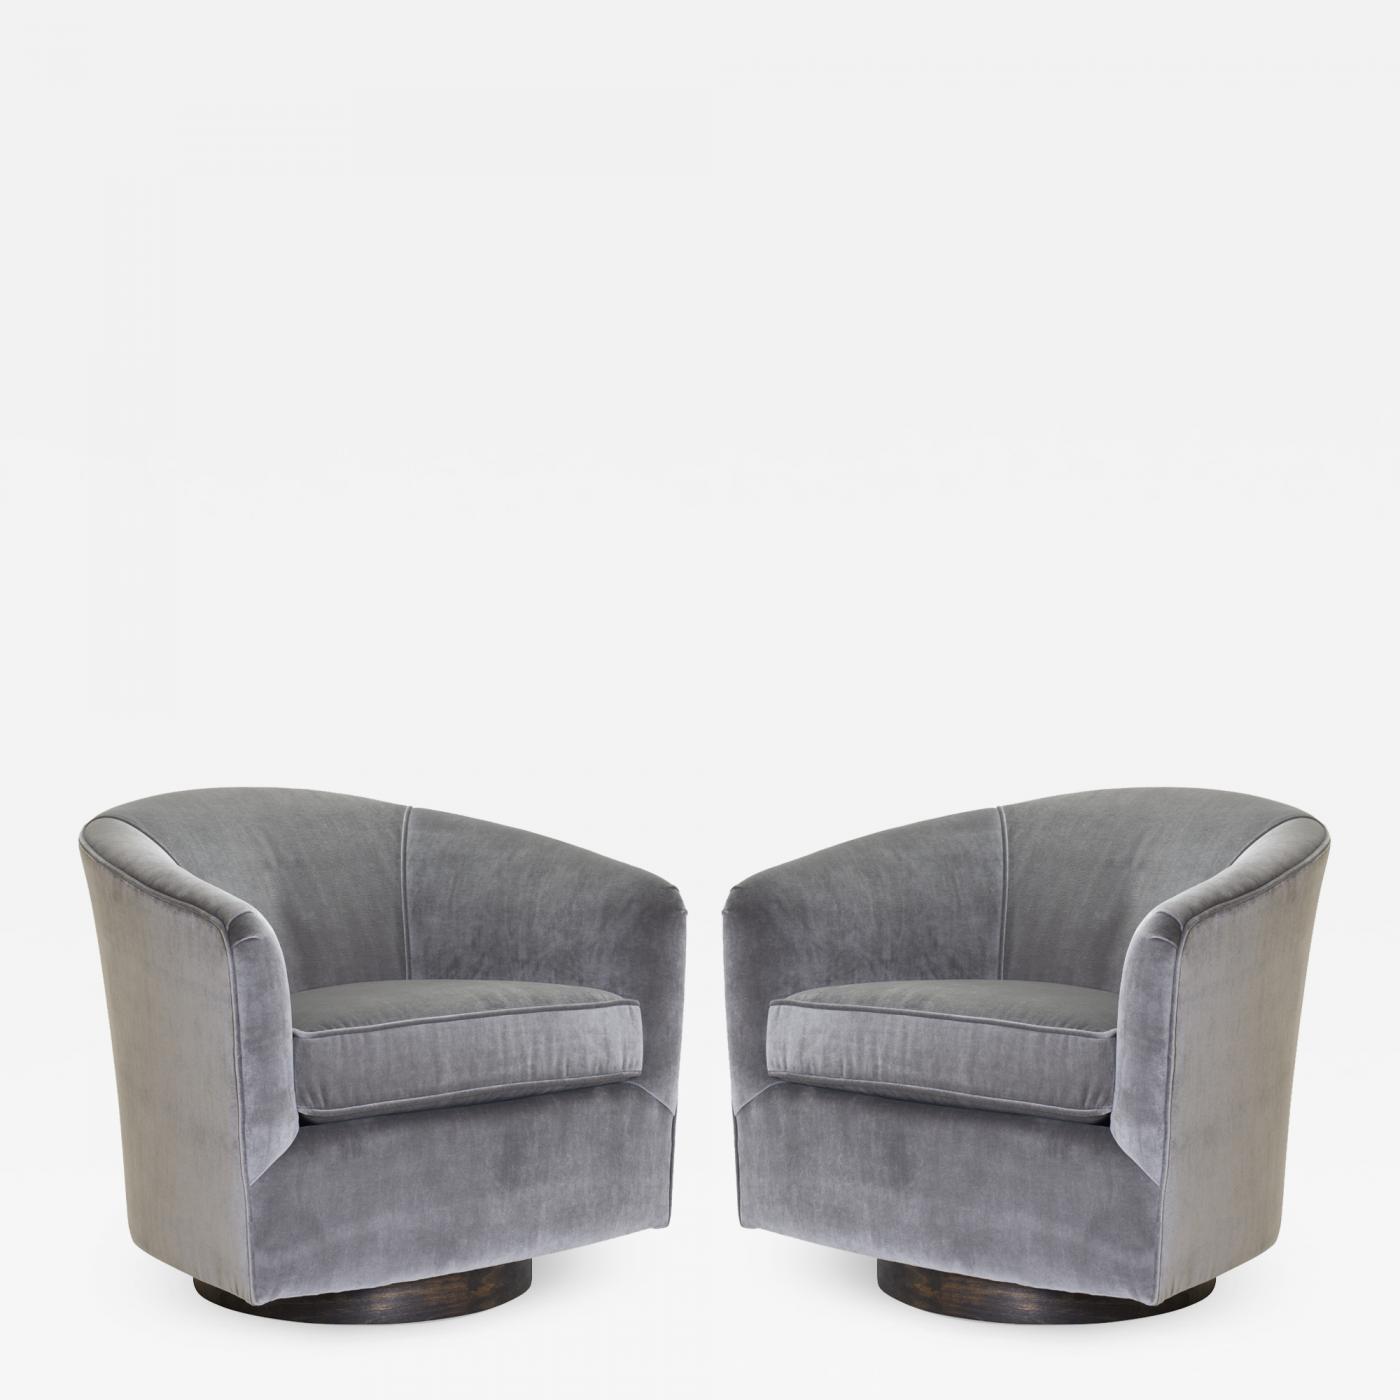 swivel tub chairs chair pads for wood floors in fog velvet walnut bases pair listings furniture seating club